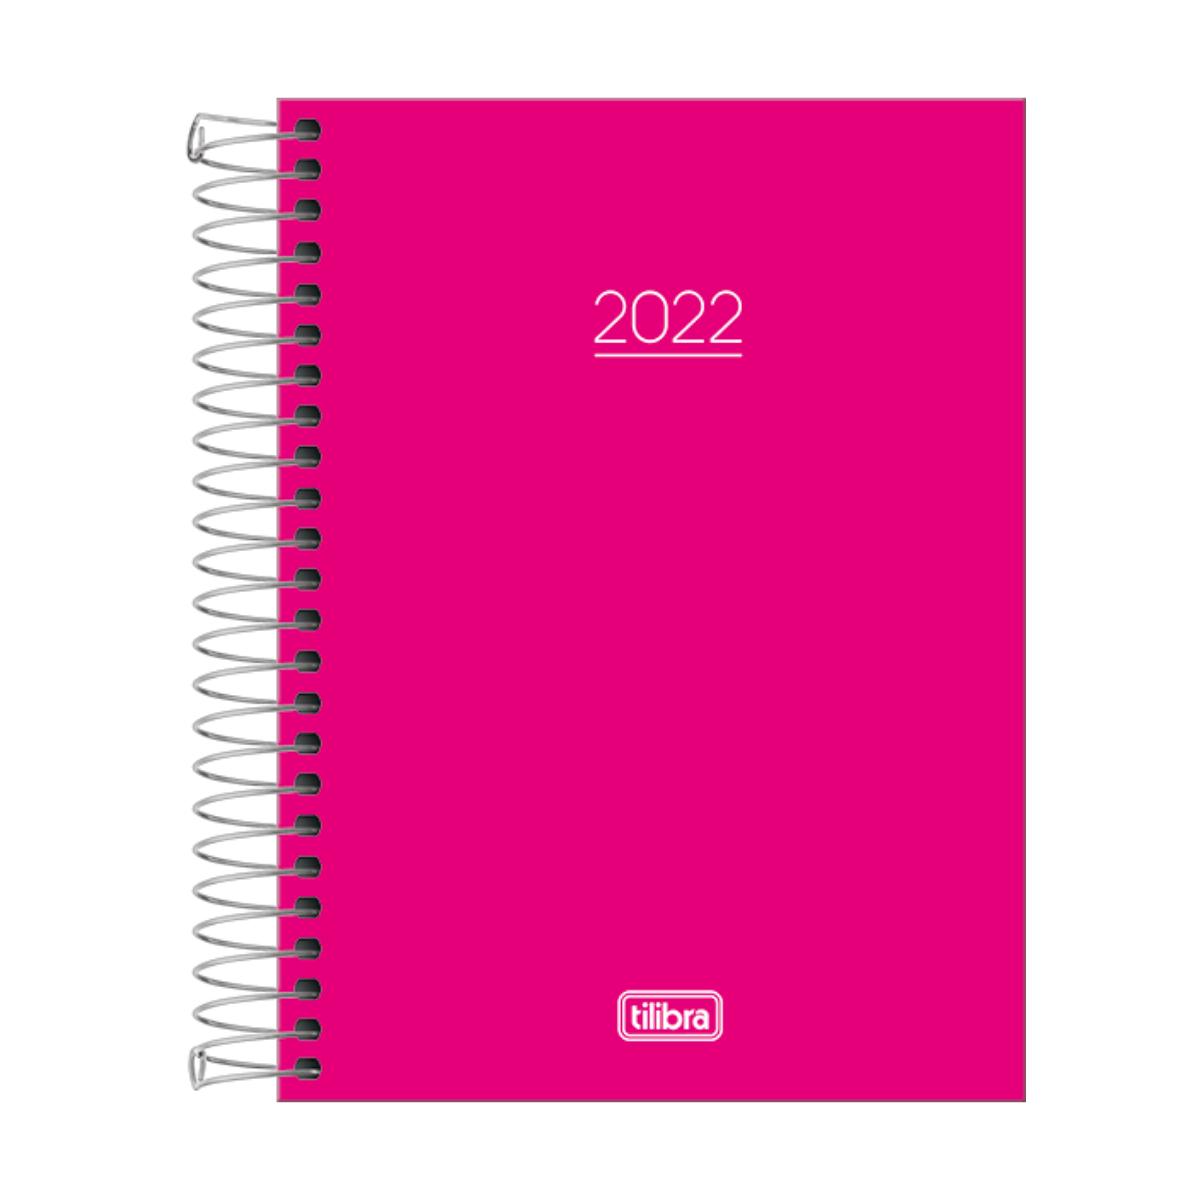 Agenda Planner 2022 Espiral Datada Rosa